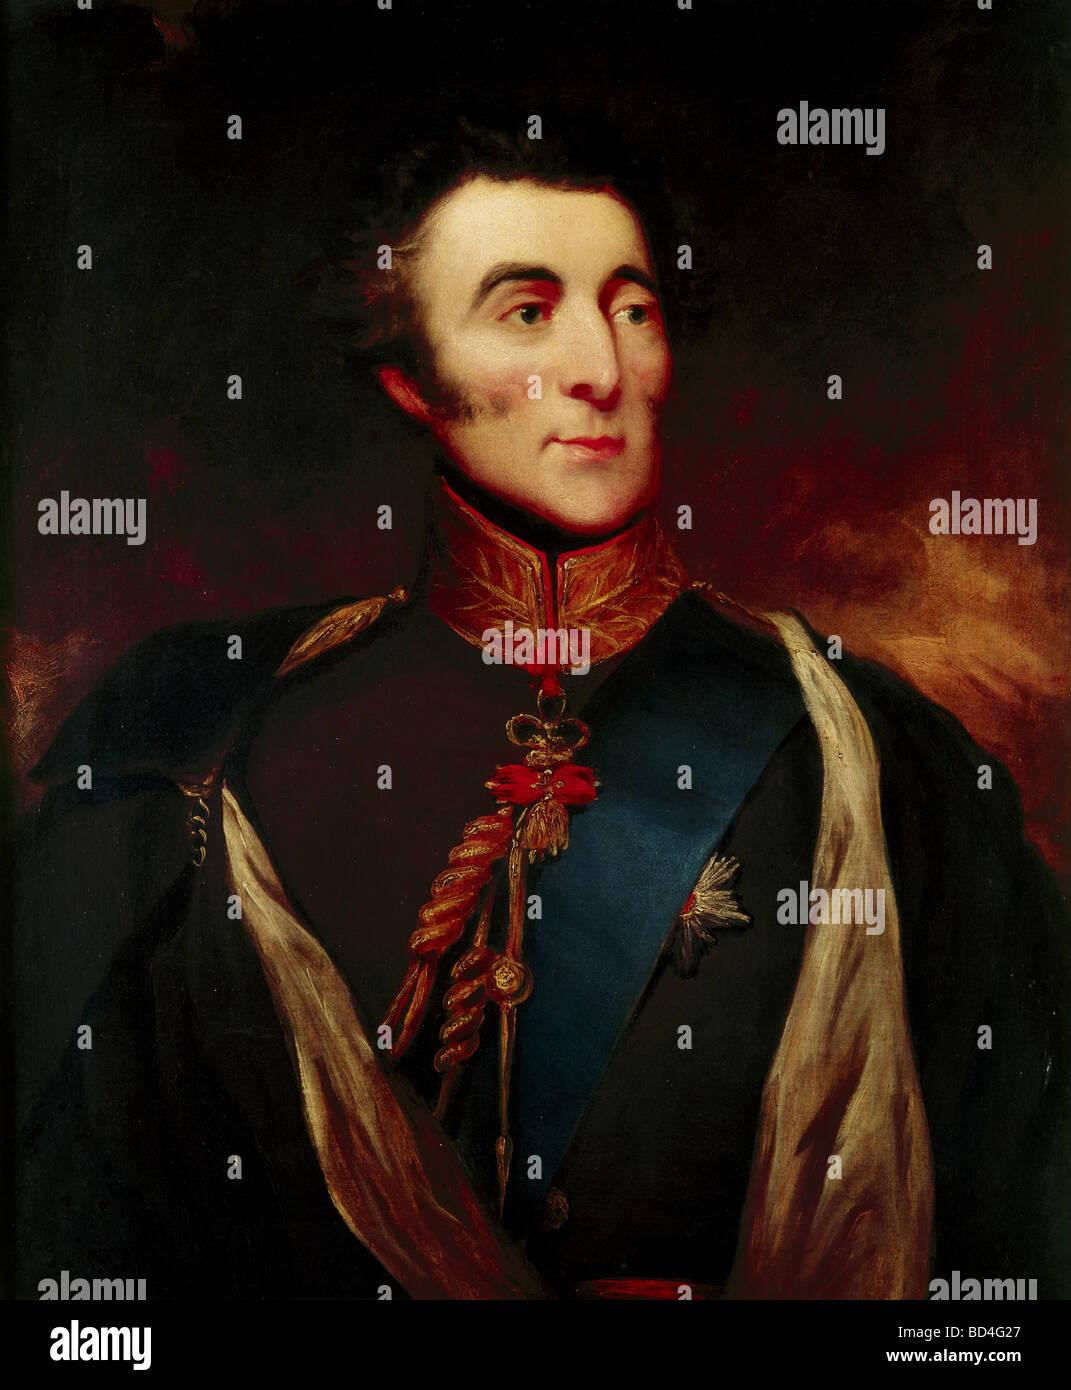 Wellington, Arthur Wellesley Duke of, 1.5.1769 - 14.9.1852, British politician, portrait, as Spanish general, anonymous - Stock Image